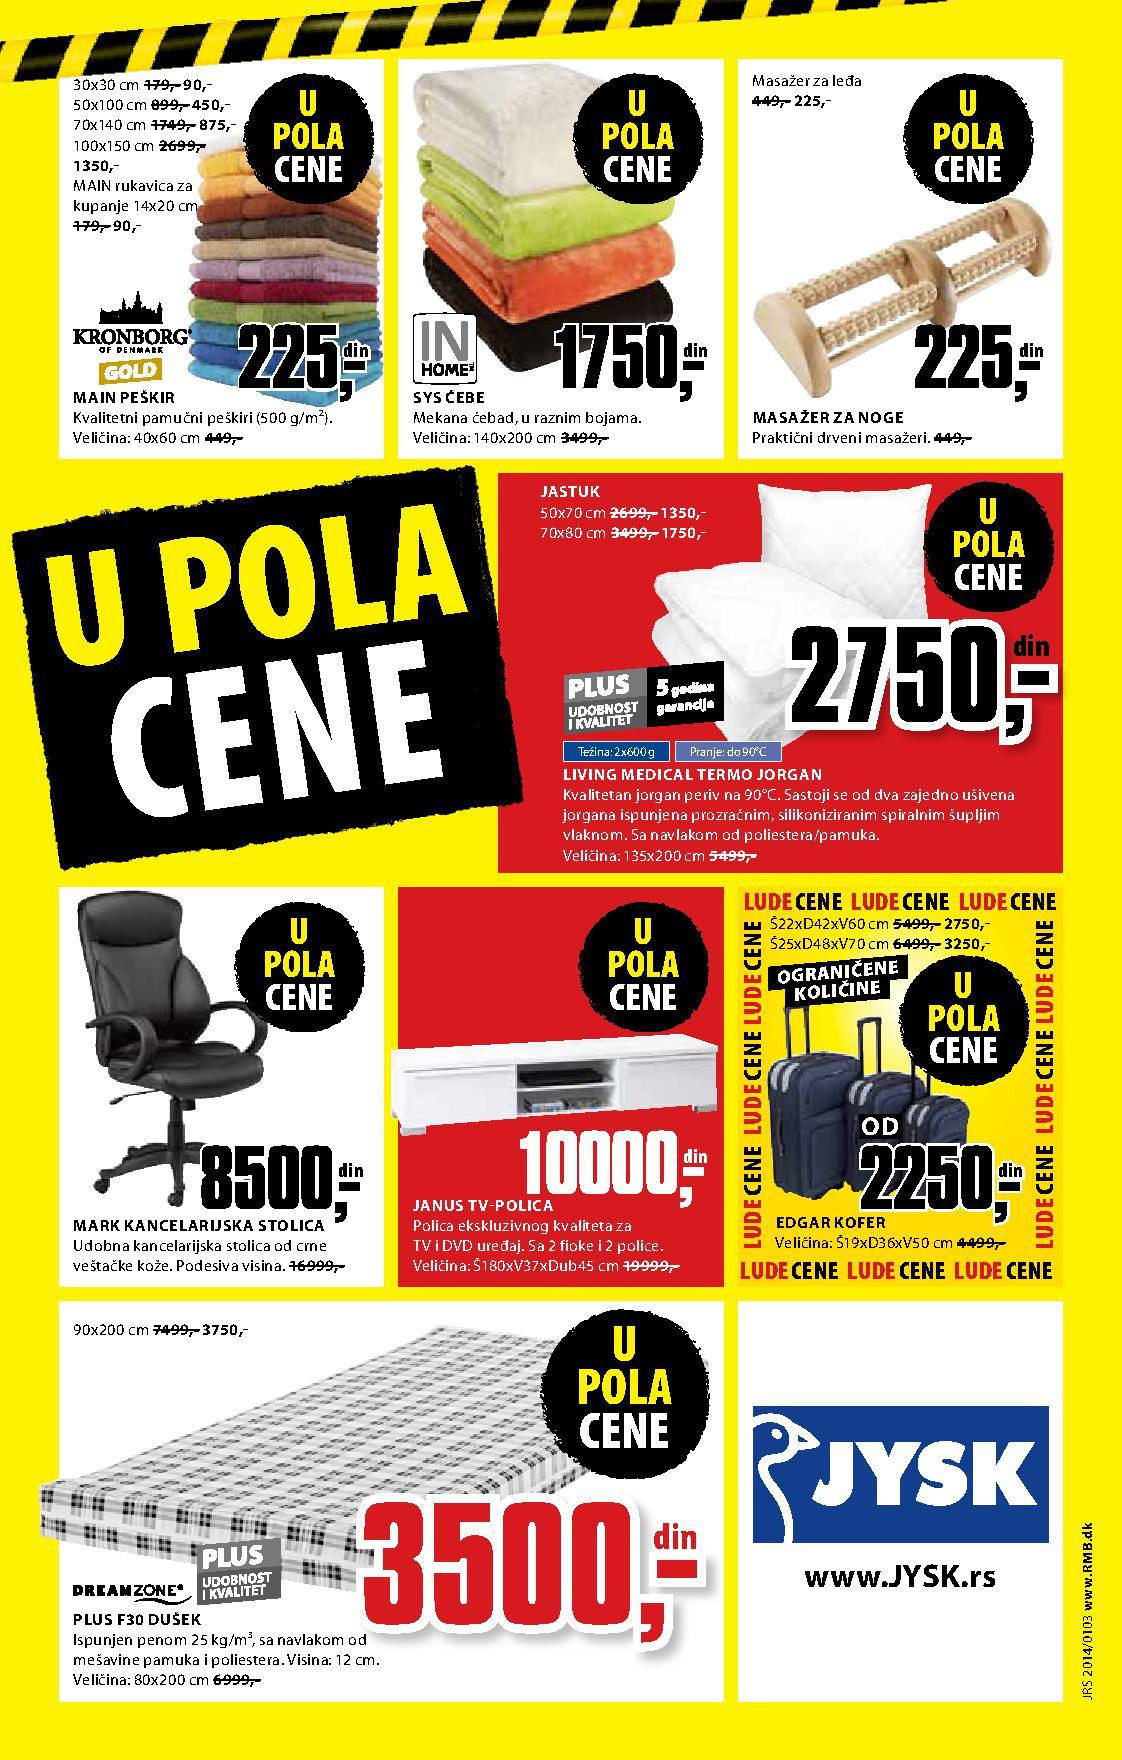 JYSK katalog super cena za vas